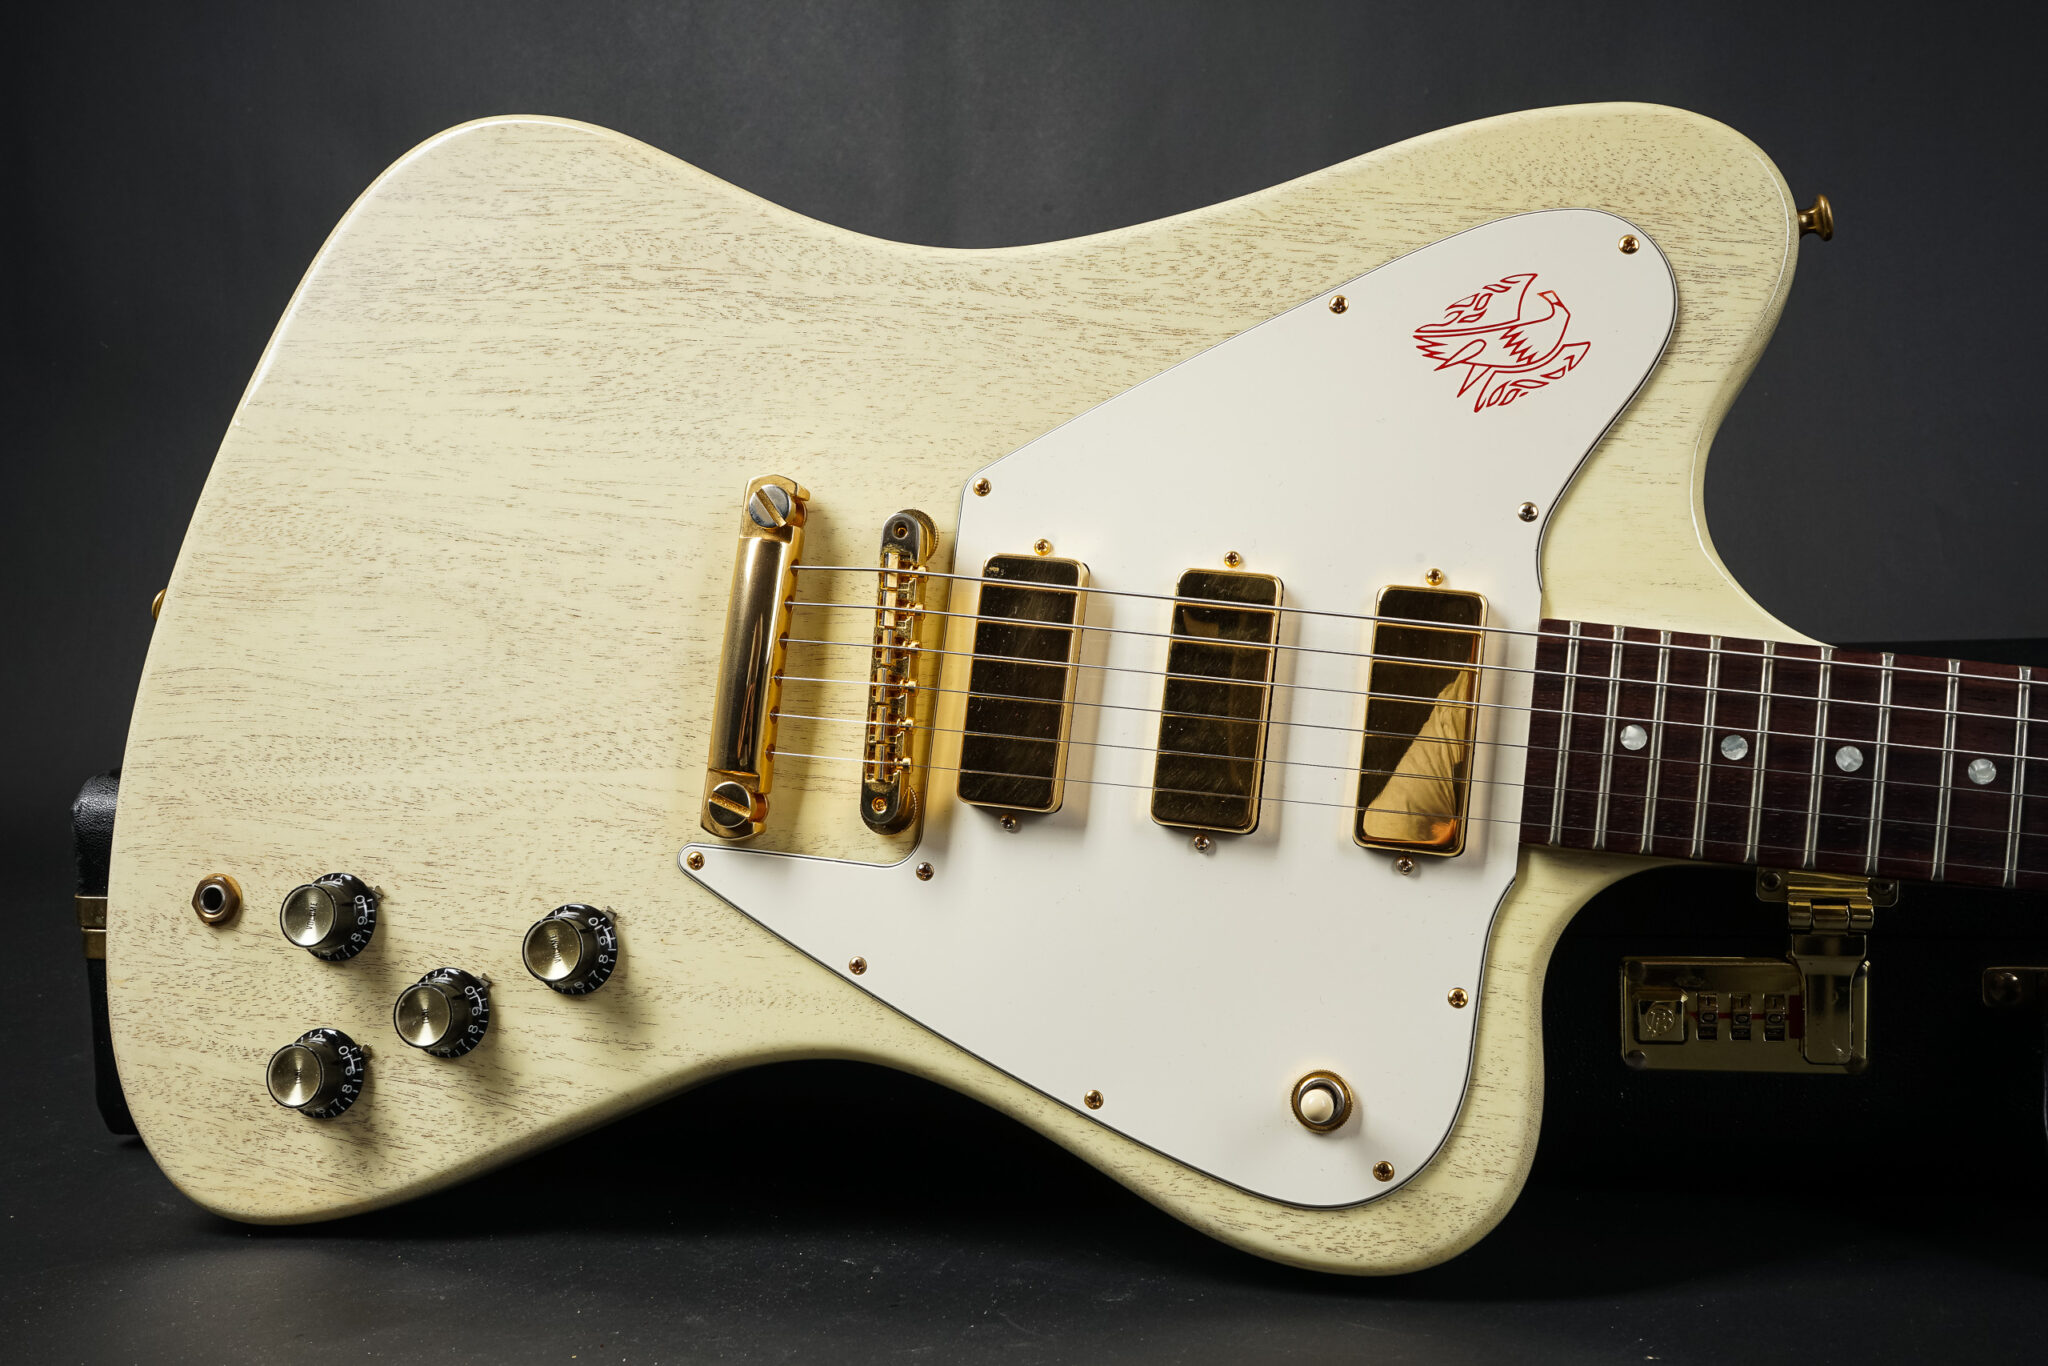 https://guitarpoint.de/app/uploads/products/2009-gibson-custom-shop-firebird-non-reverse-tv-white/2009-Gibson-Firebird-Nonreverse-TVWhite-CS97427-8-2048x1366.jpg